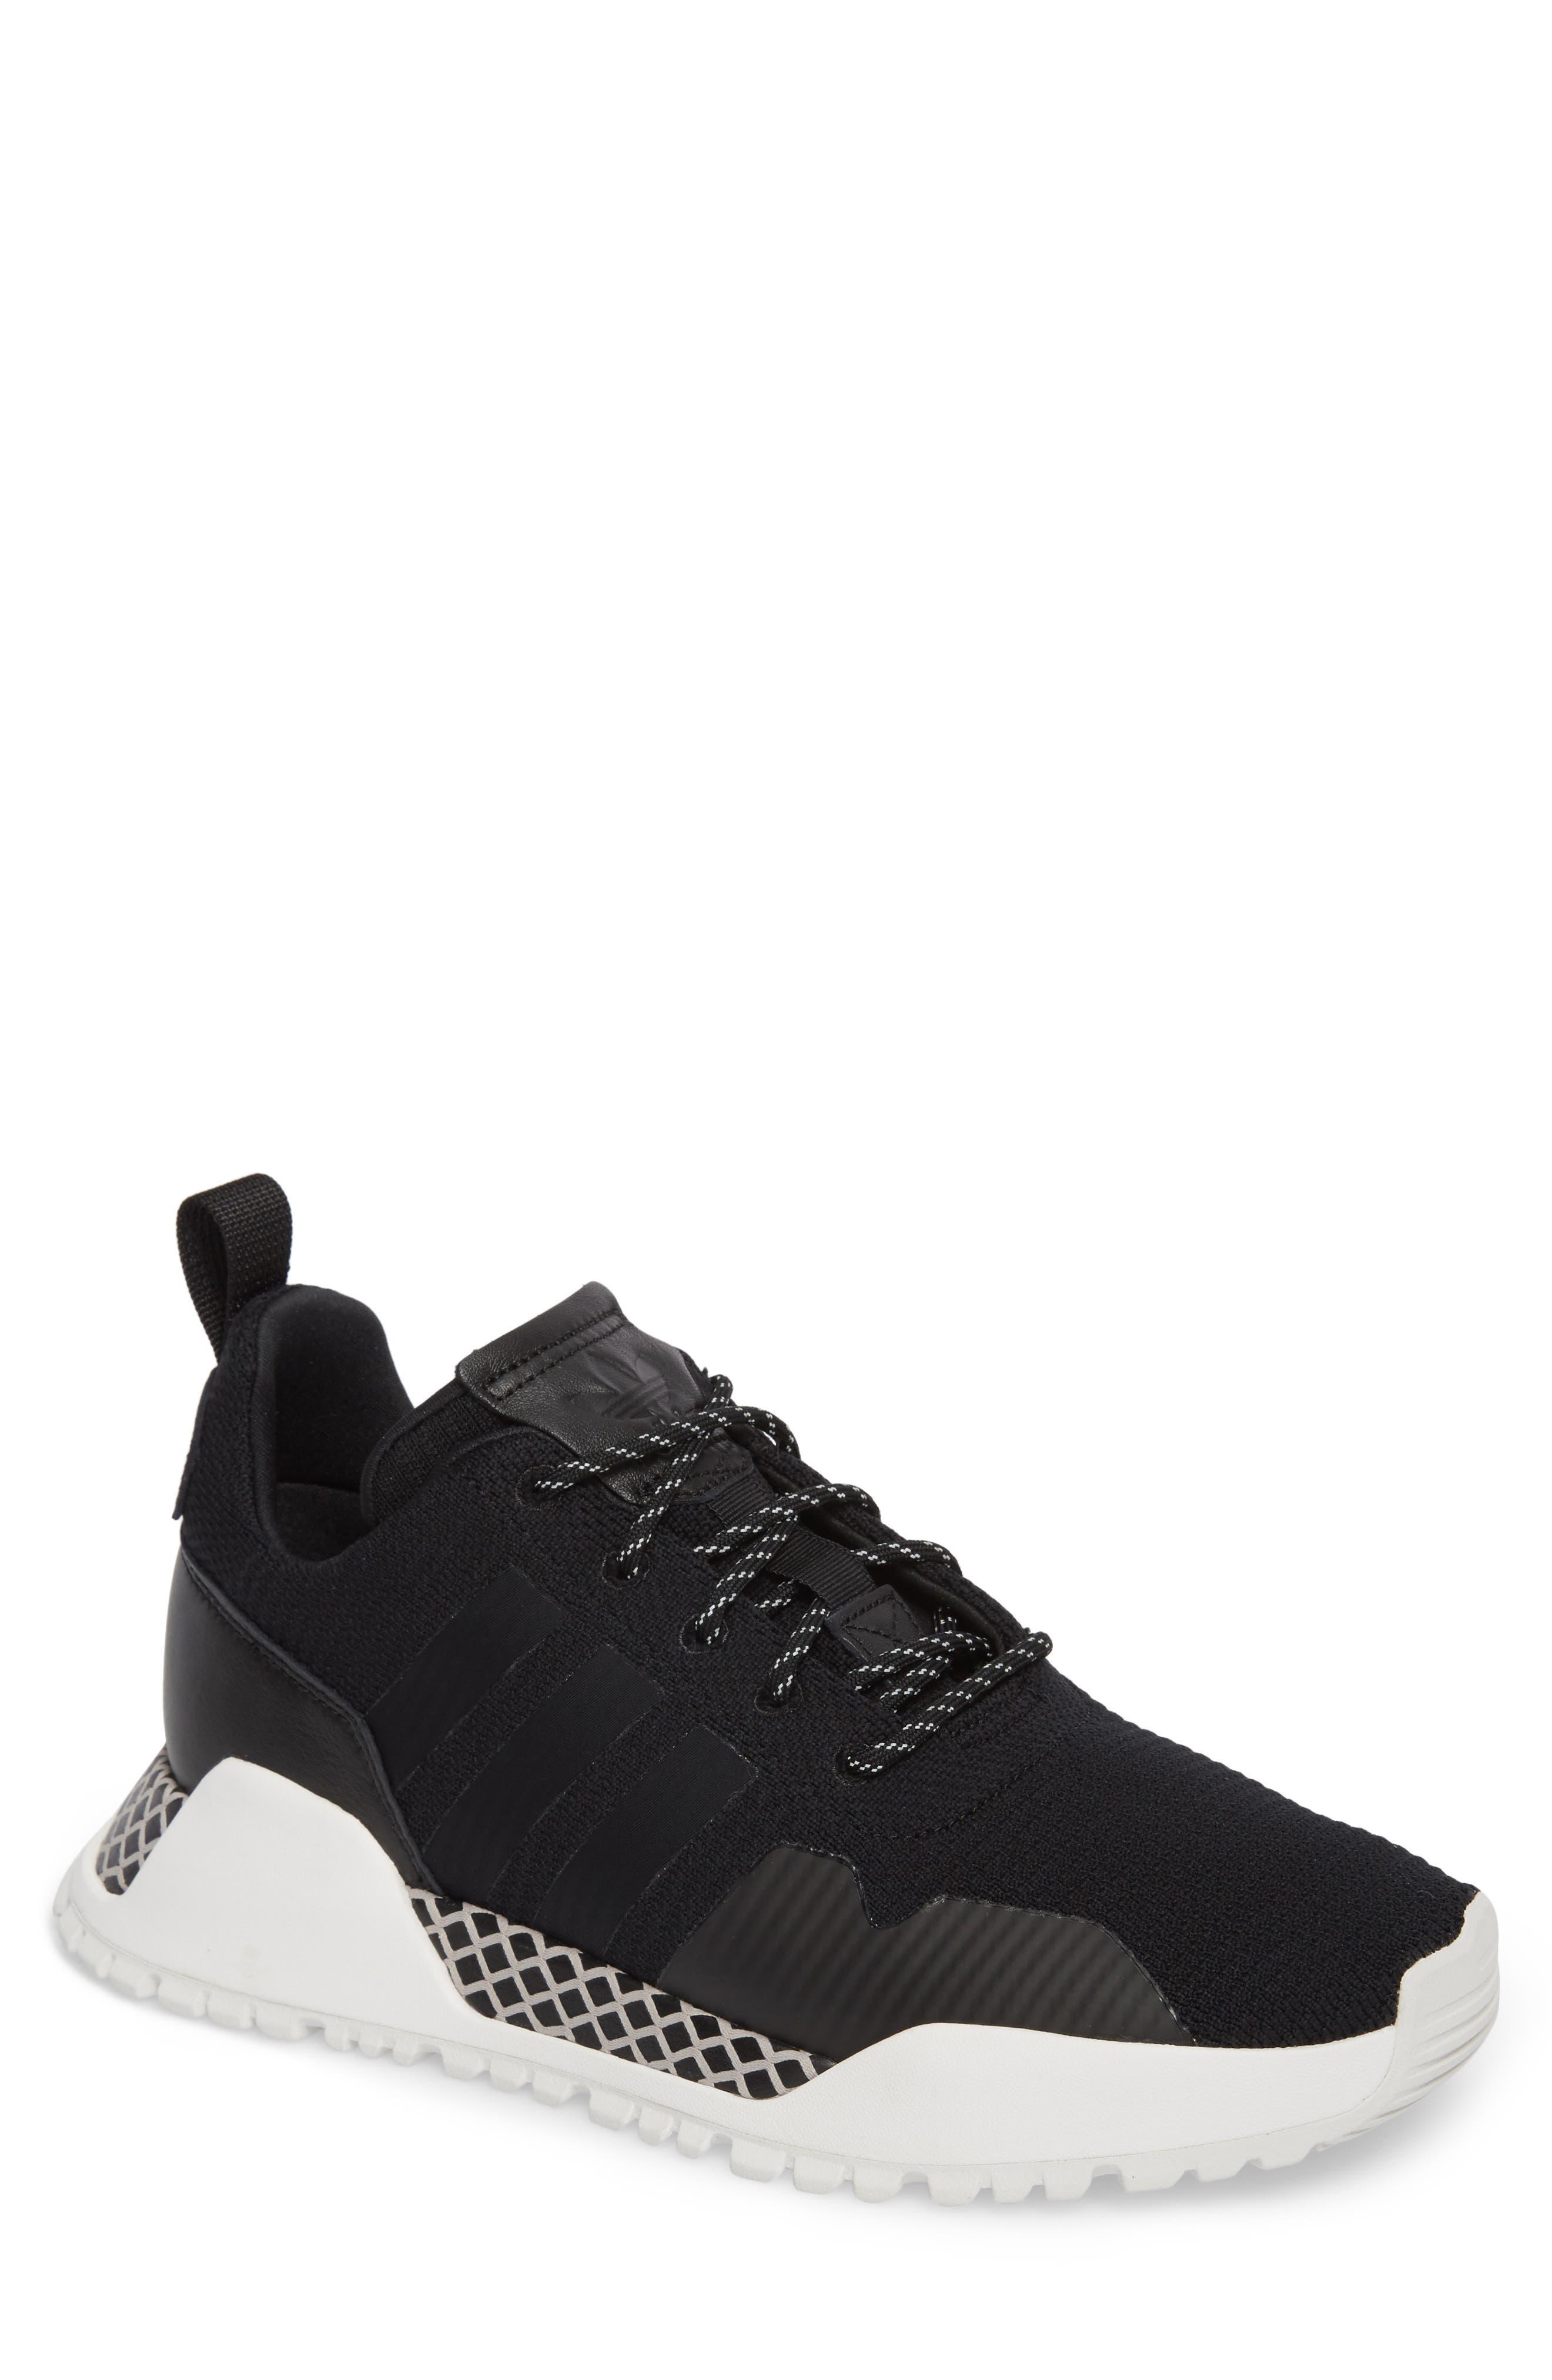 adidas F/1.4 PK Water Repellent Sneaker (Men)